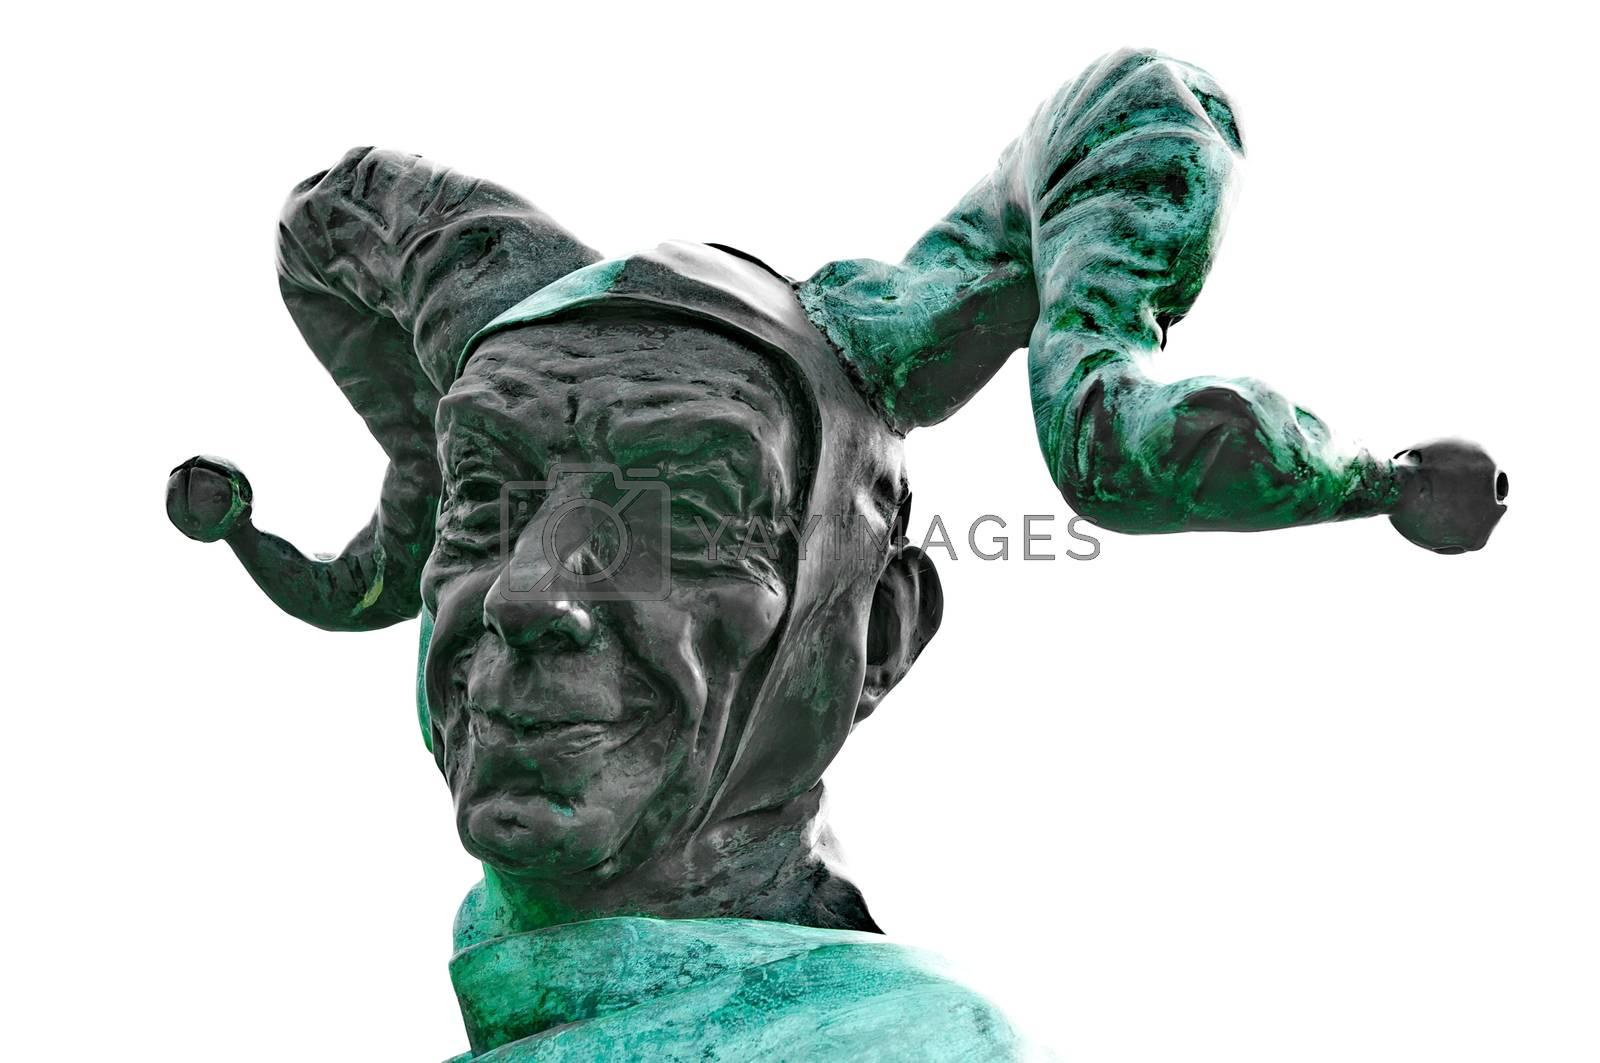 Statue of a clown